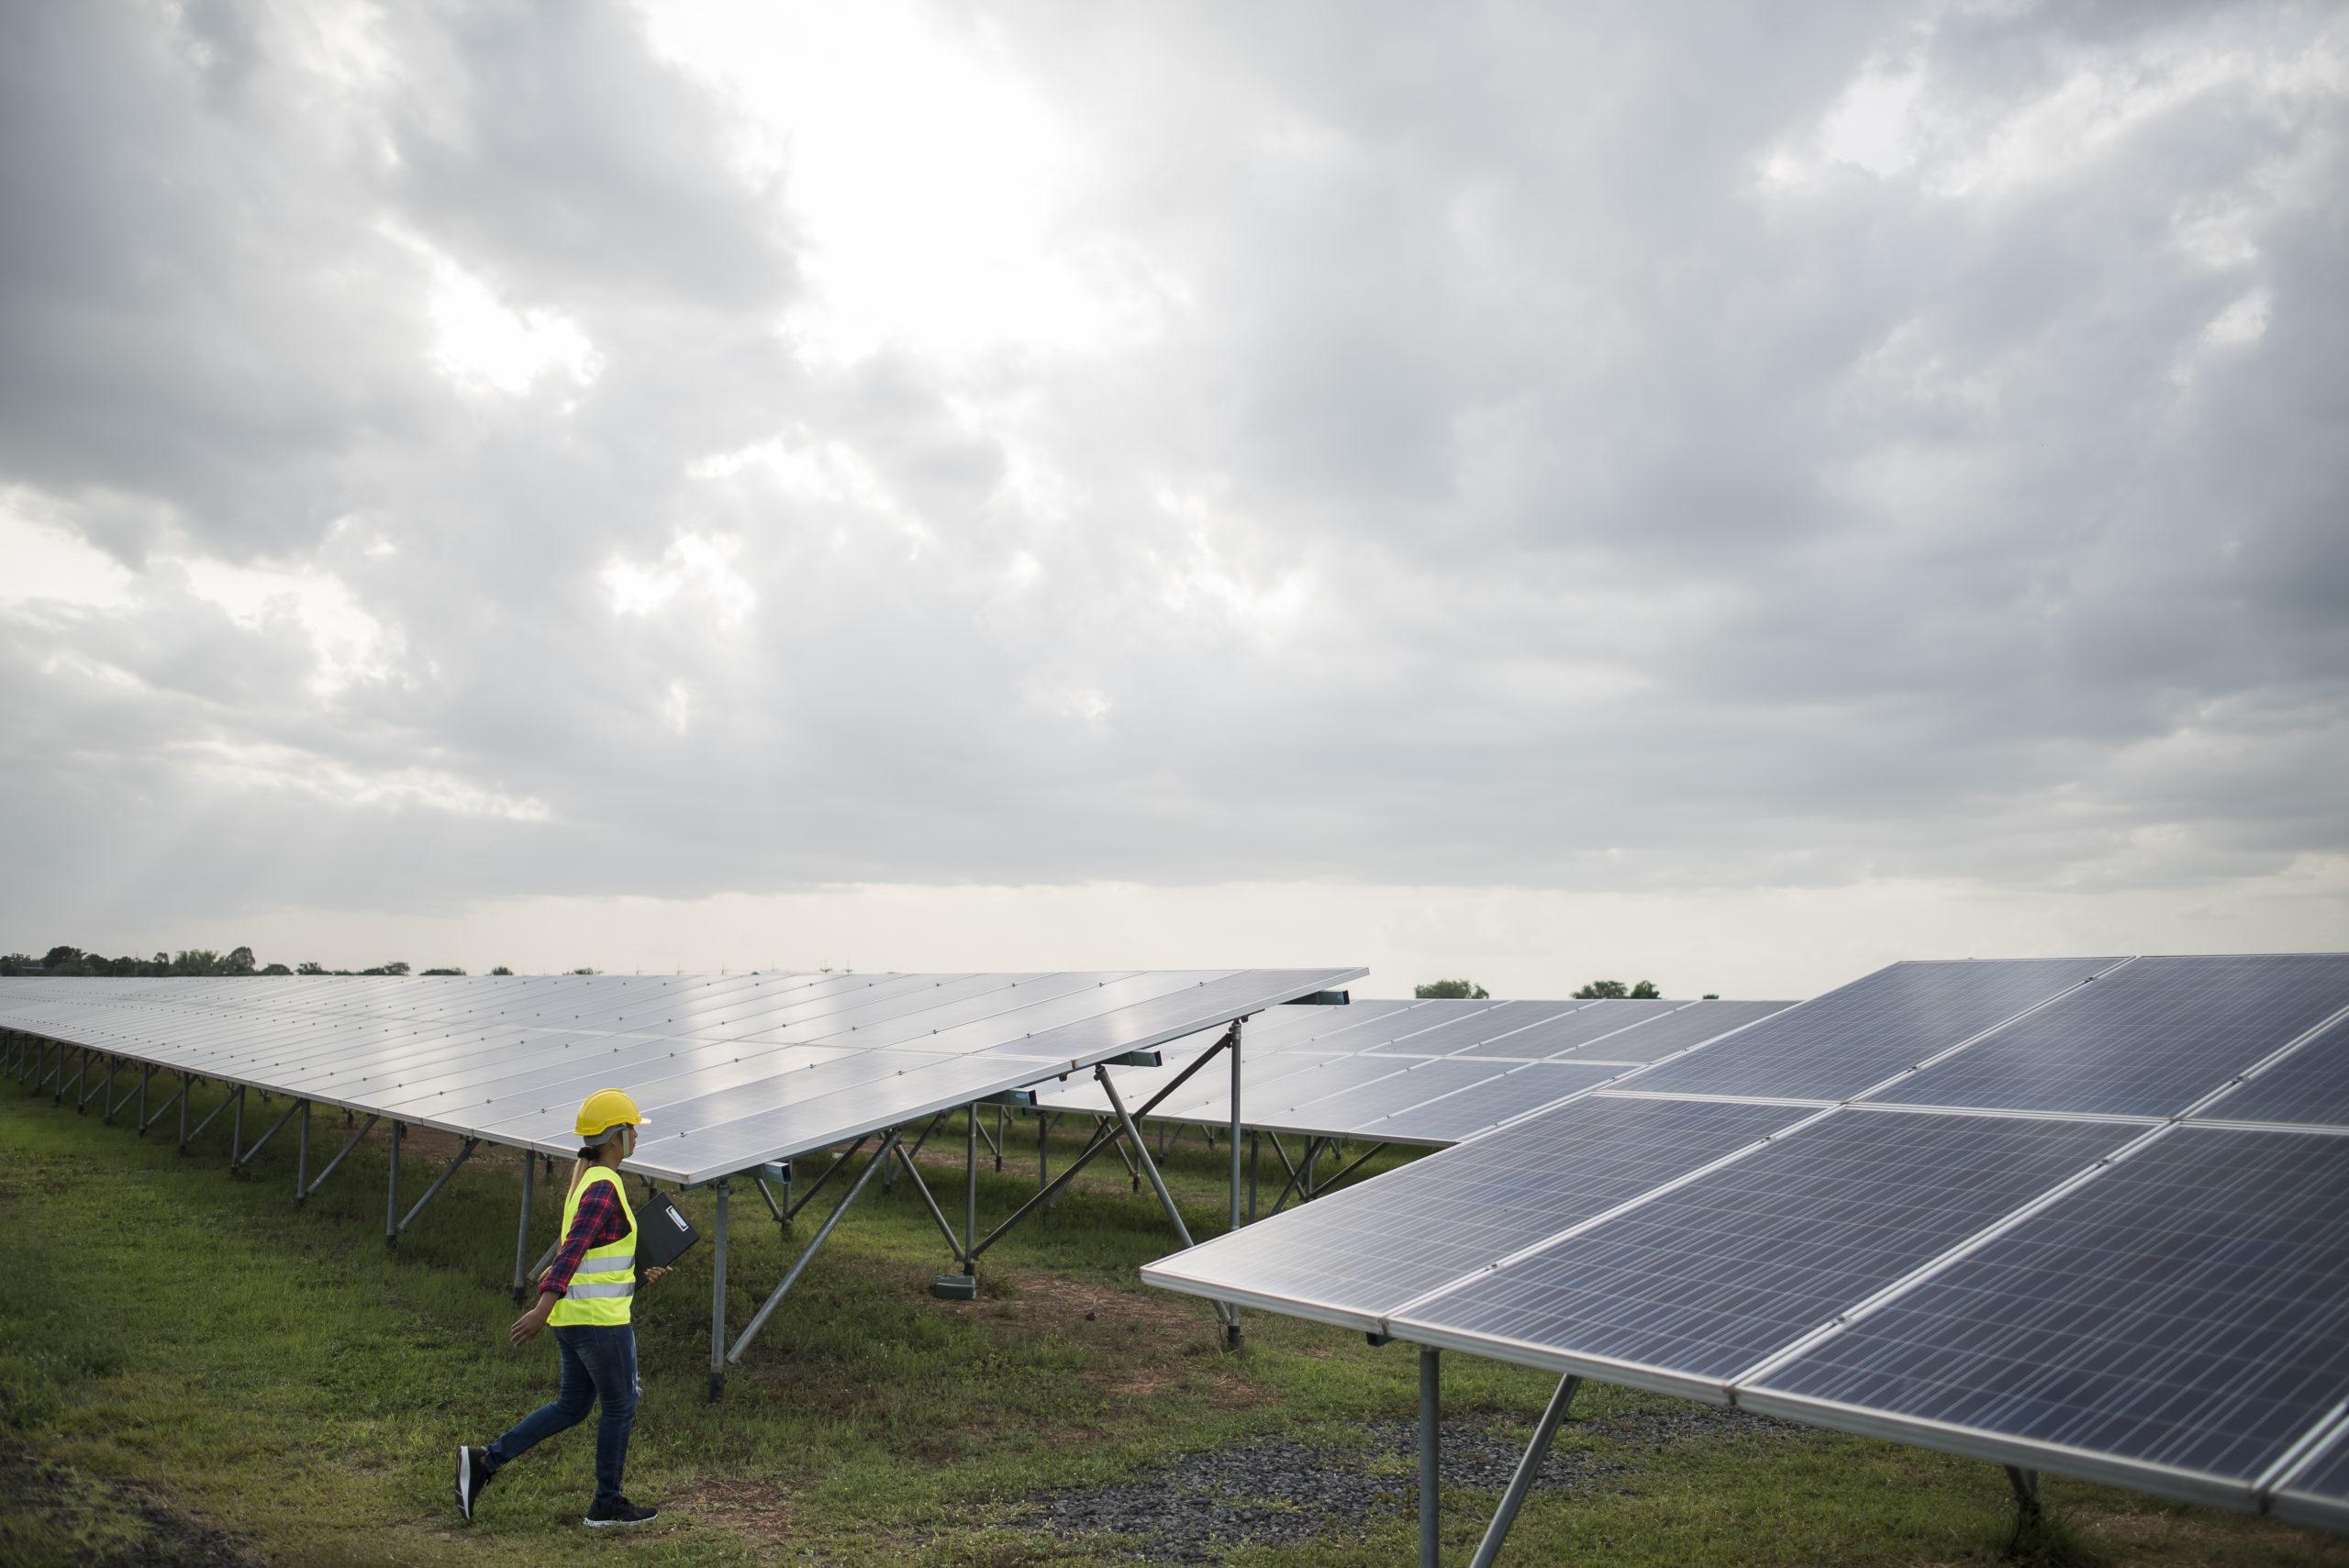 Entenda como funcionam as fazendas solares